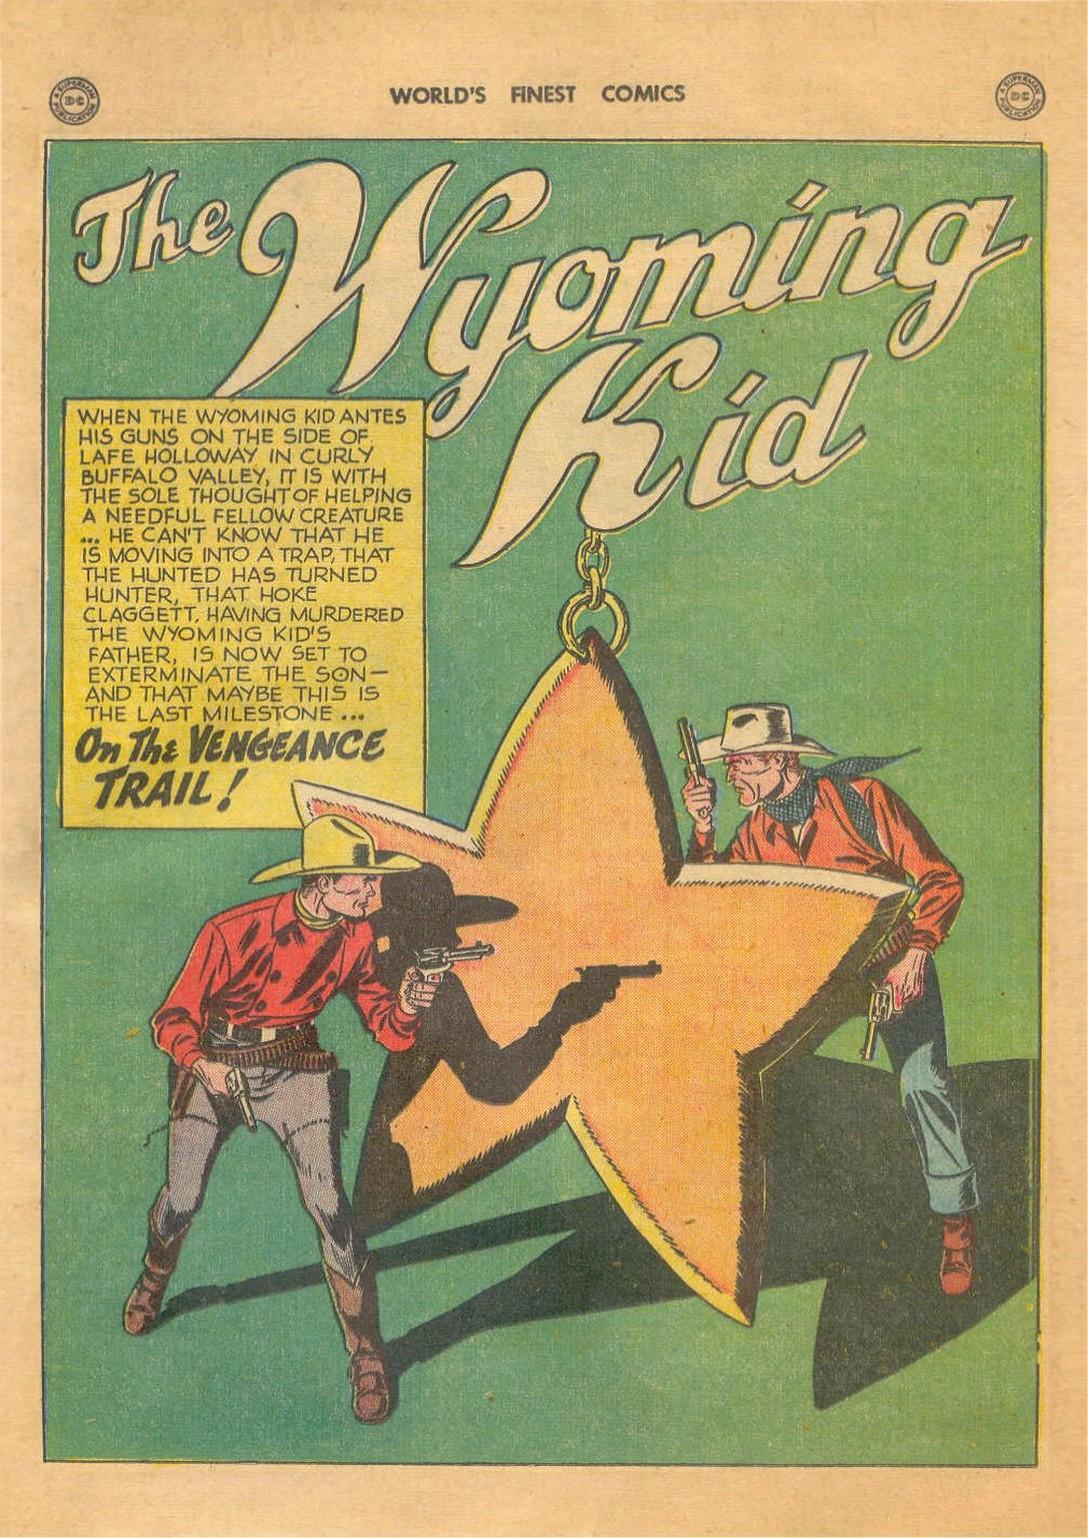 Read online World's Finest Comics comic -  Issue #42 - 37